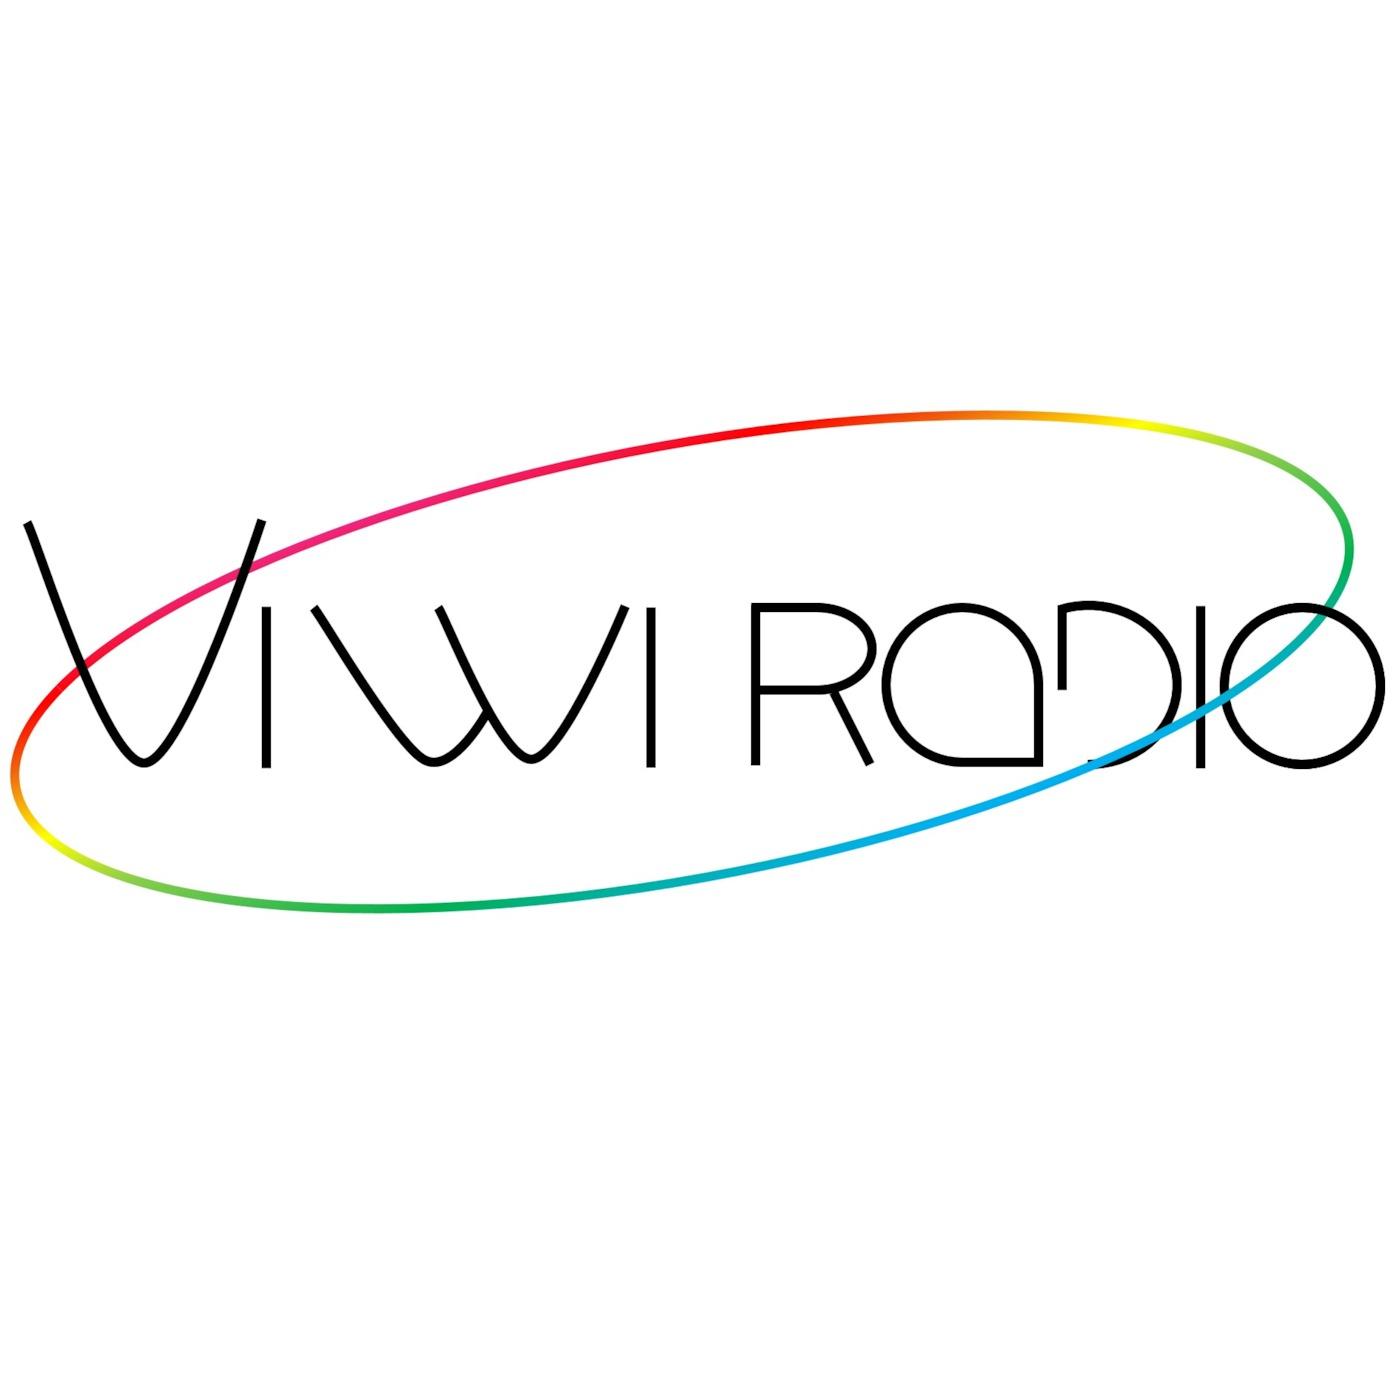 Viwi Radio